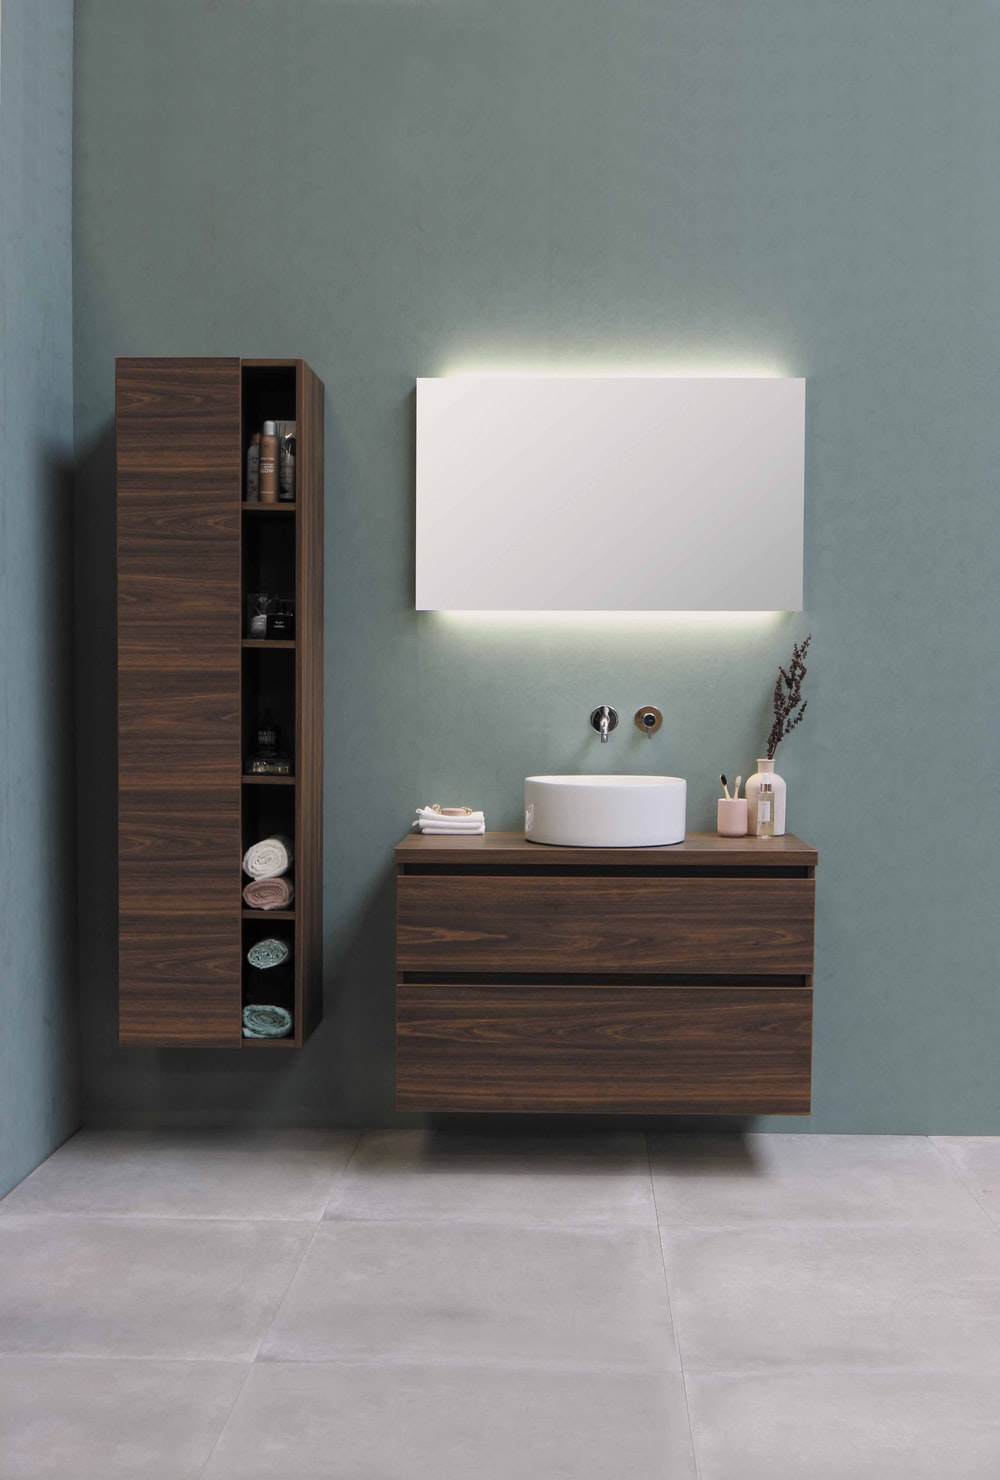 white ceramic sink beside brown wooden cabinet